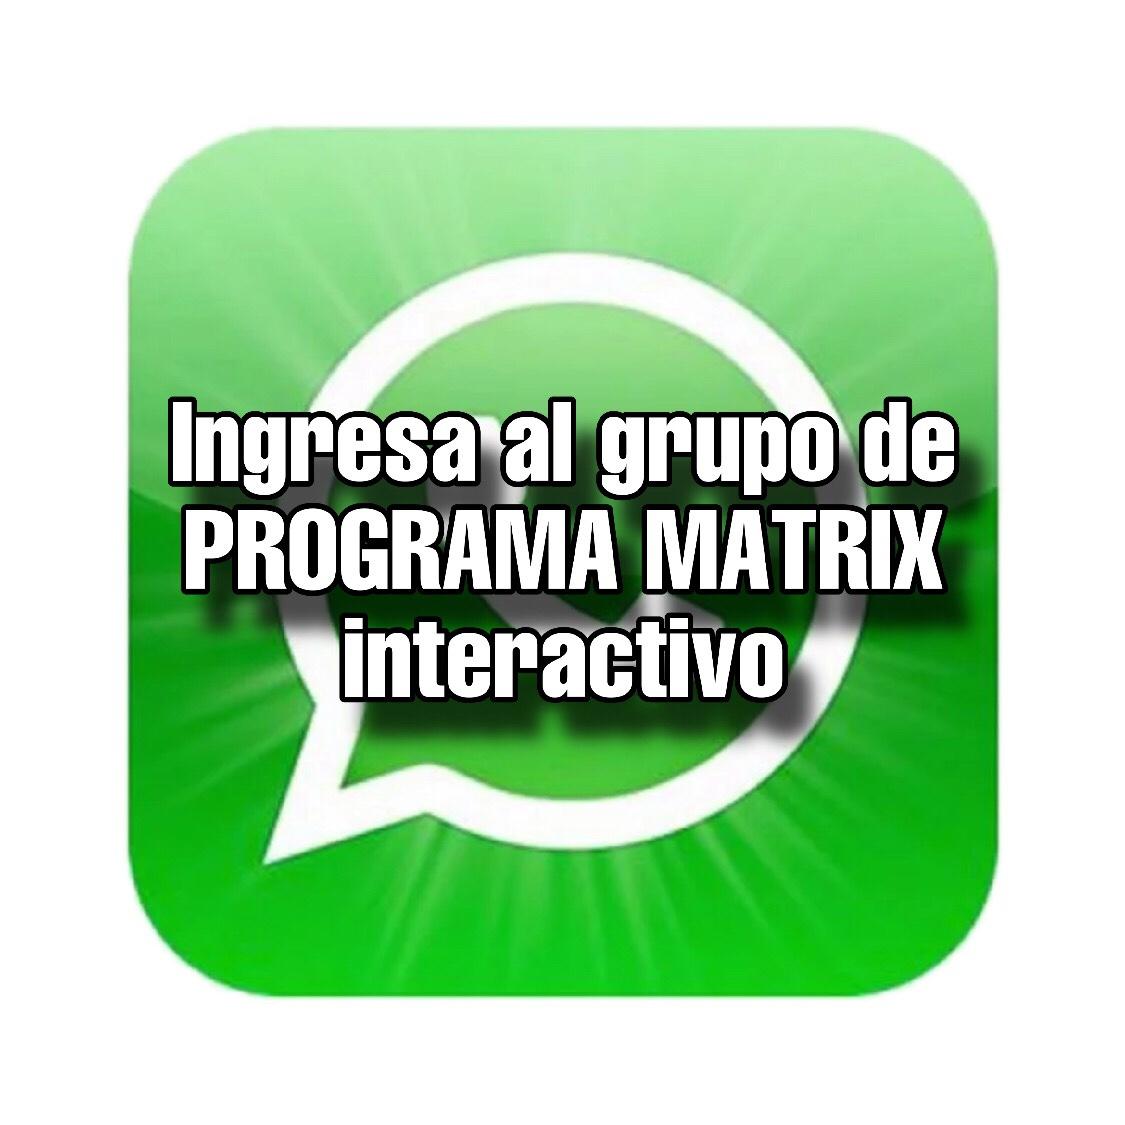 Ingresa al grupo de PROGRAMA MATRIX interactivo